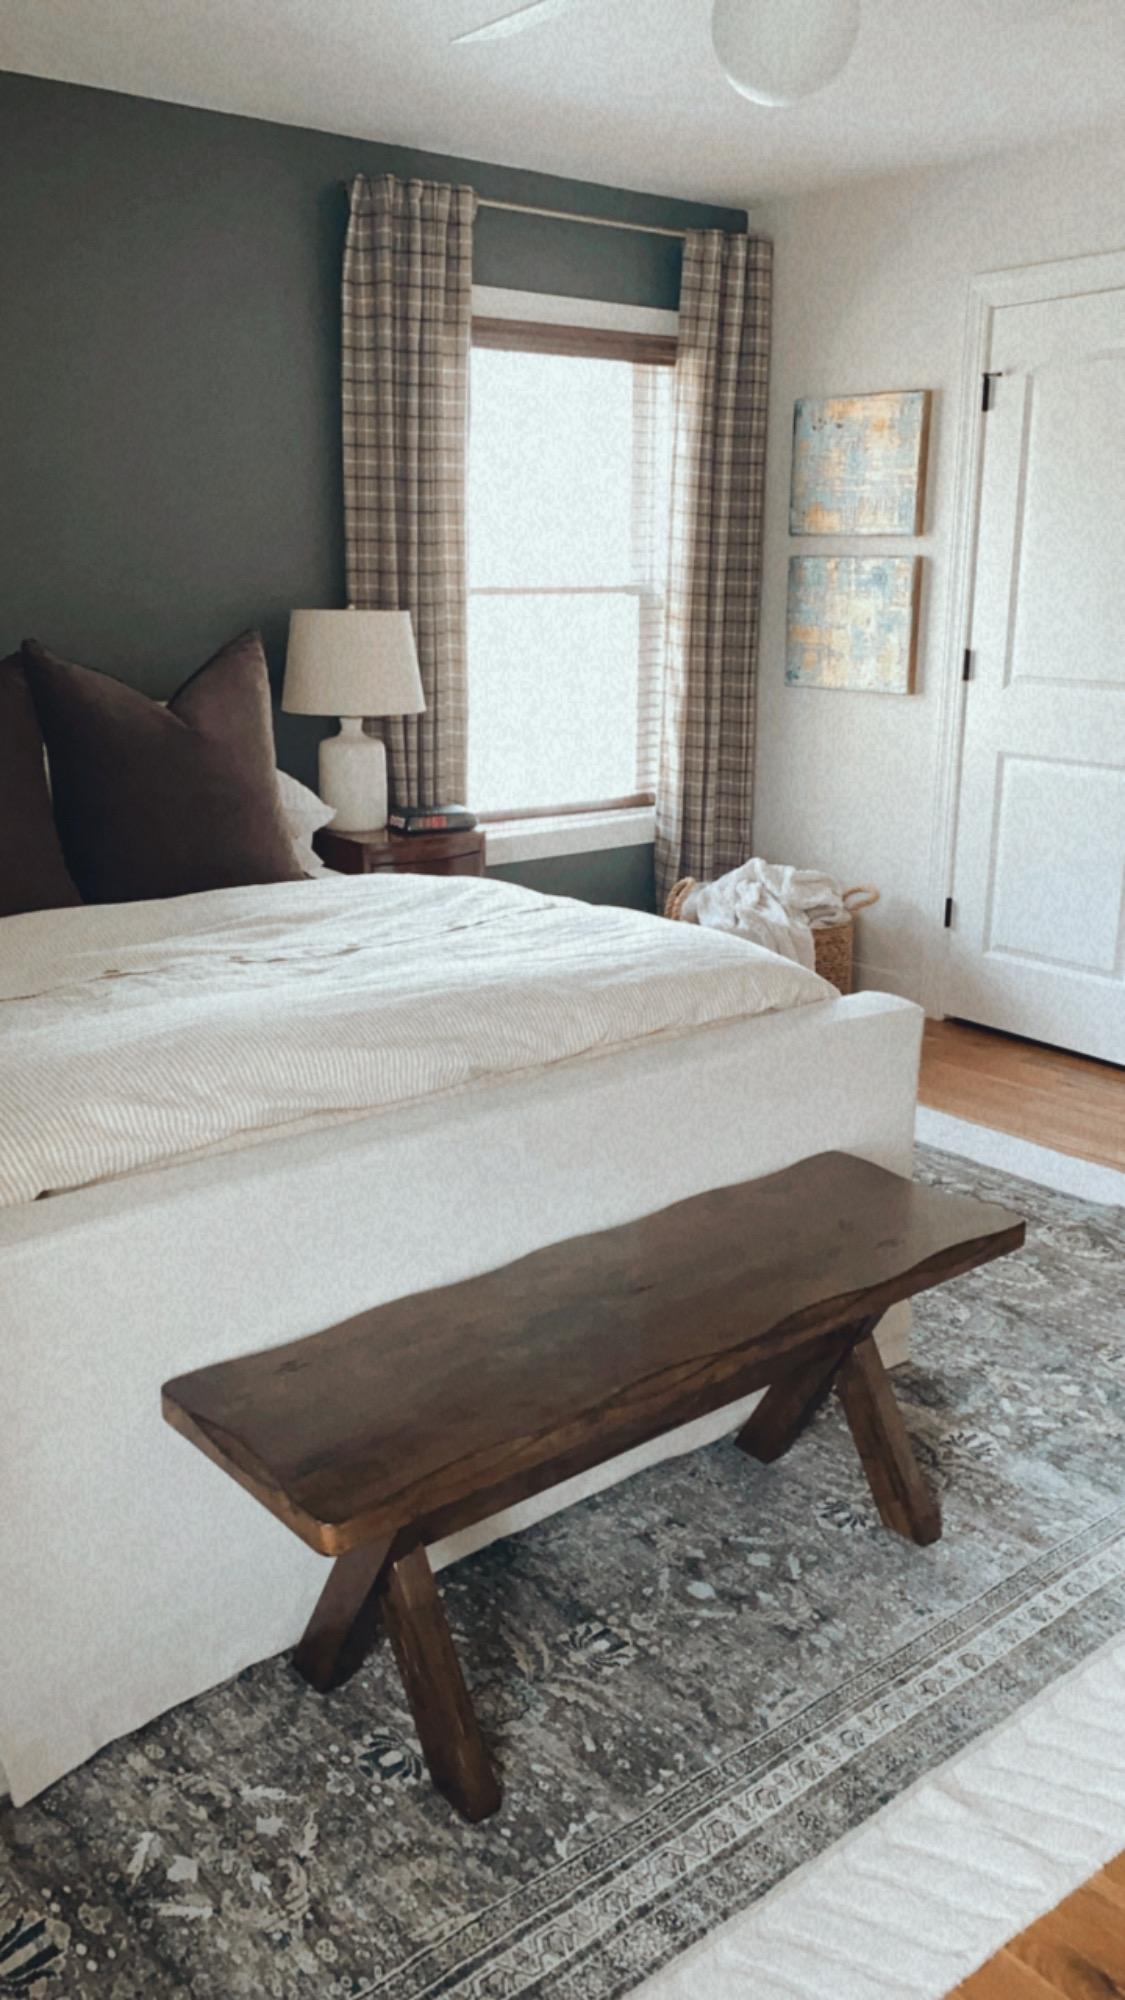 Recent Bedroom Decor Updates | Louella Reese